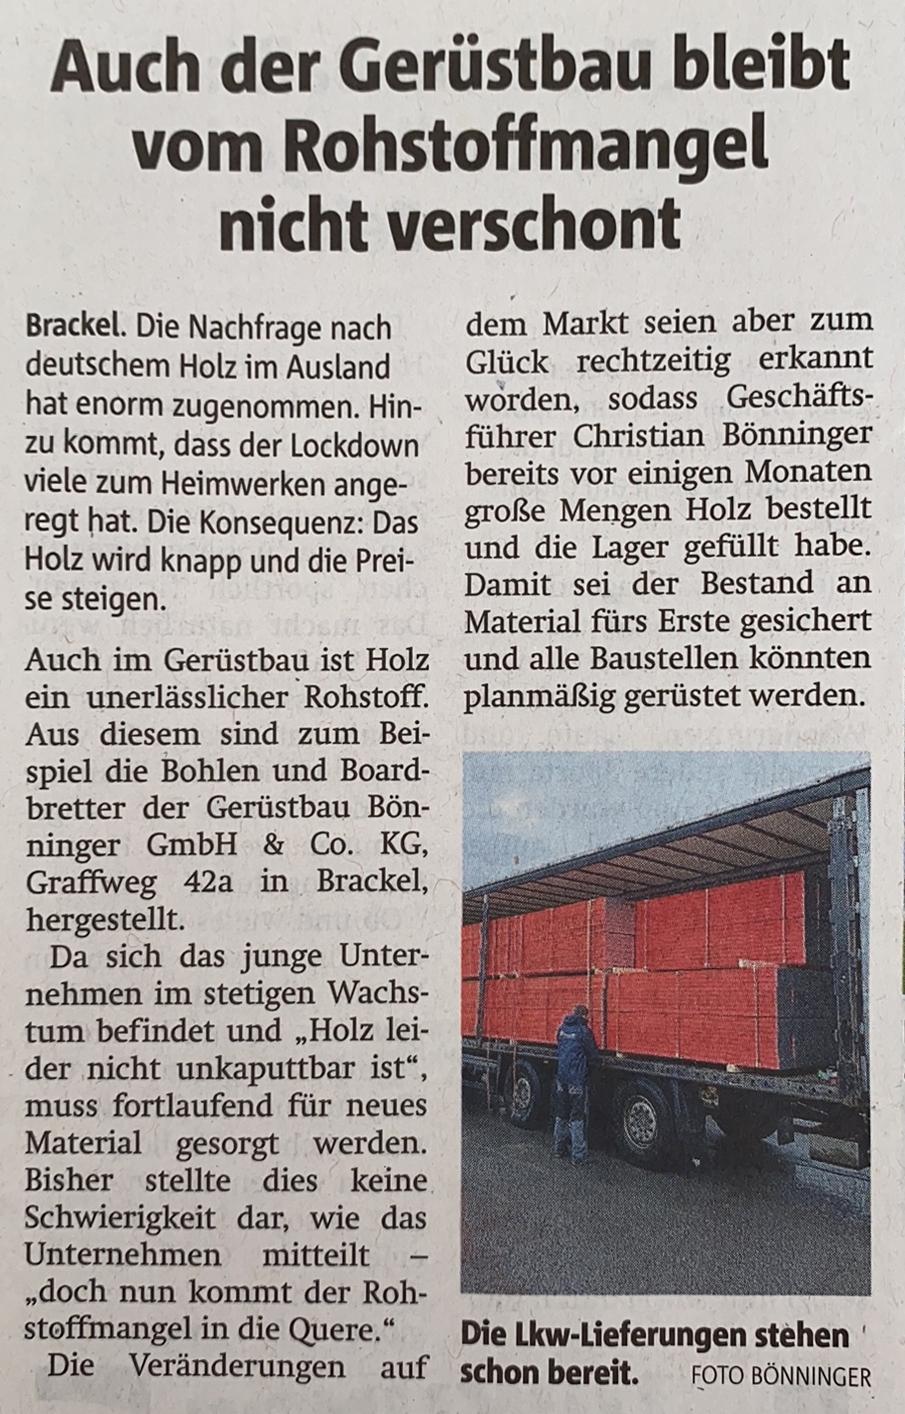 Gerüstbau Bönninger – Holzlieferung Dortmund Rohstoffmangel